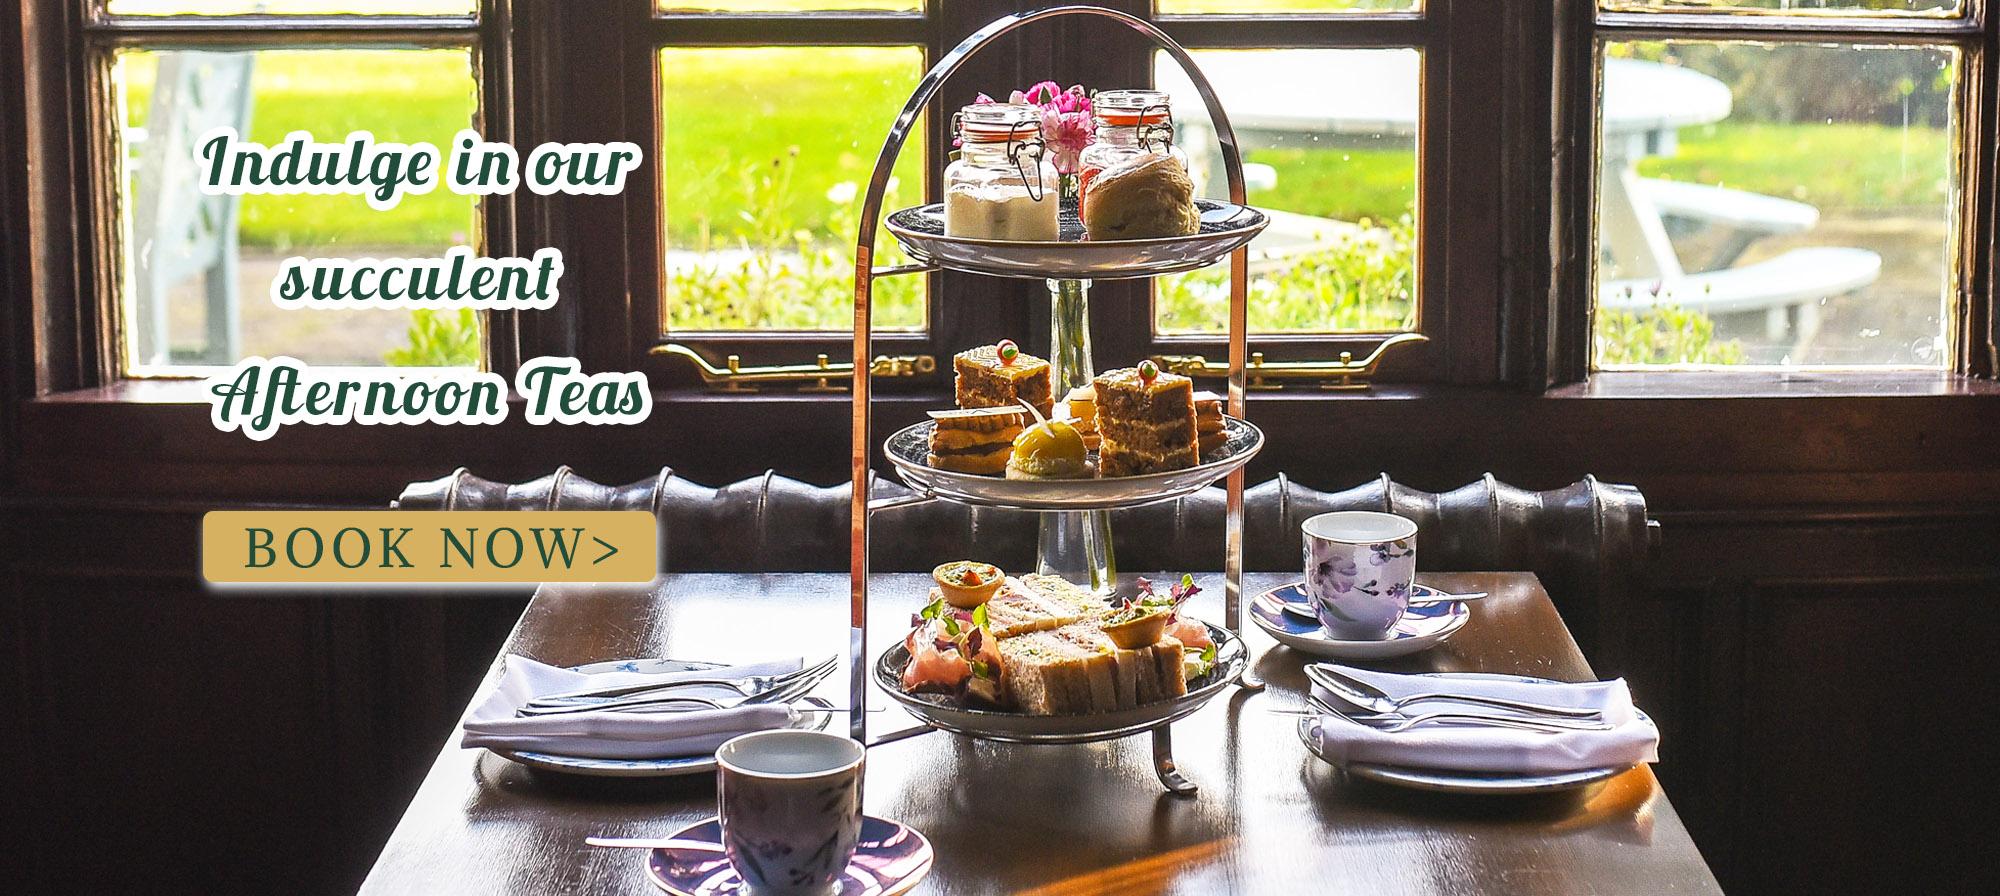 Afternoon Tea Lancashire Hotel